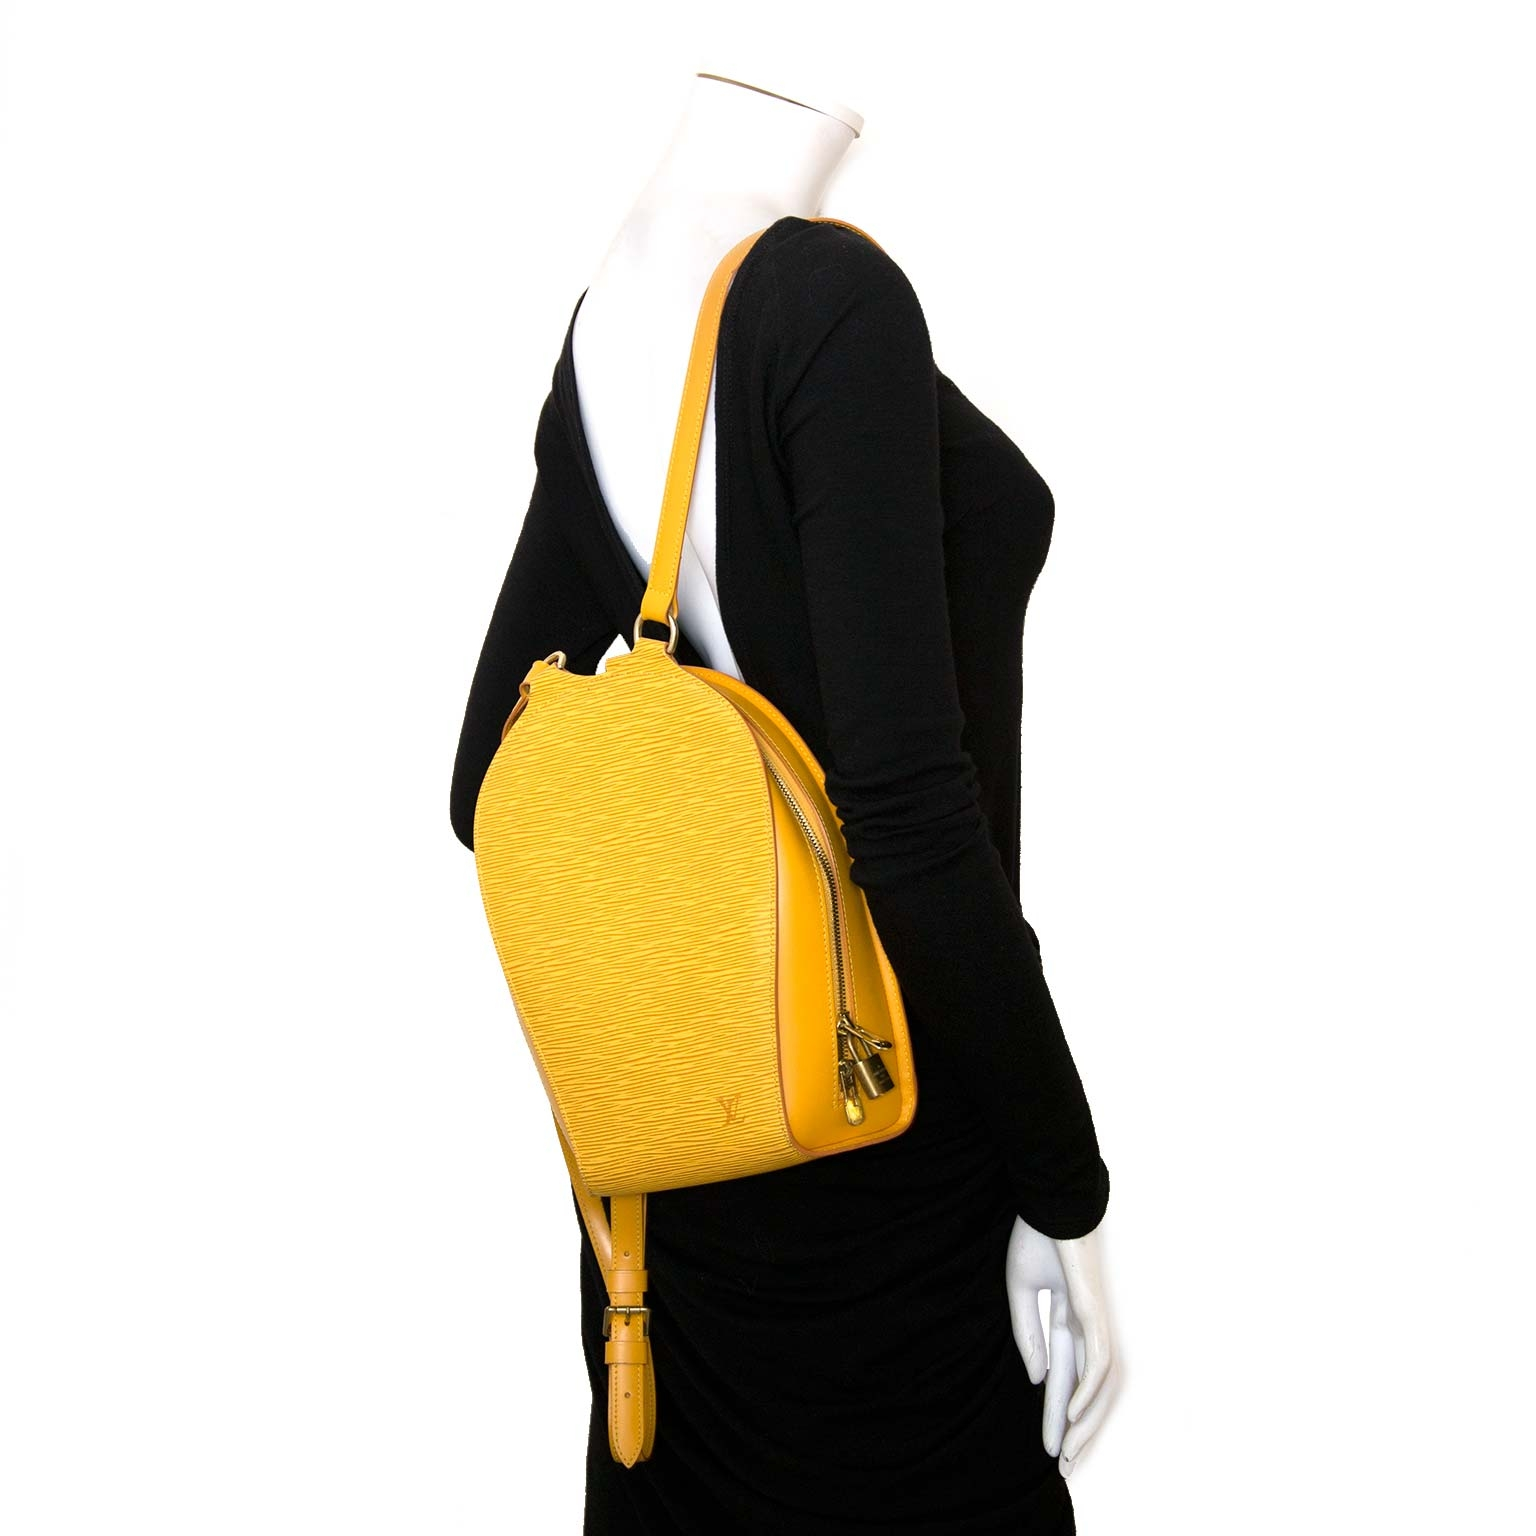 Authentic Louis Vuitton Mabillon backpack now online at Labellov vintage webshop